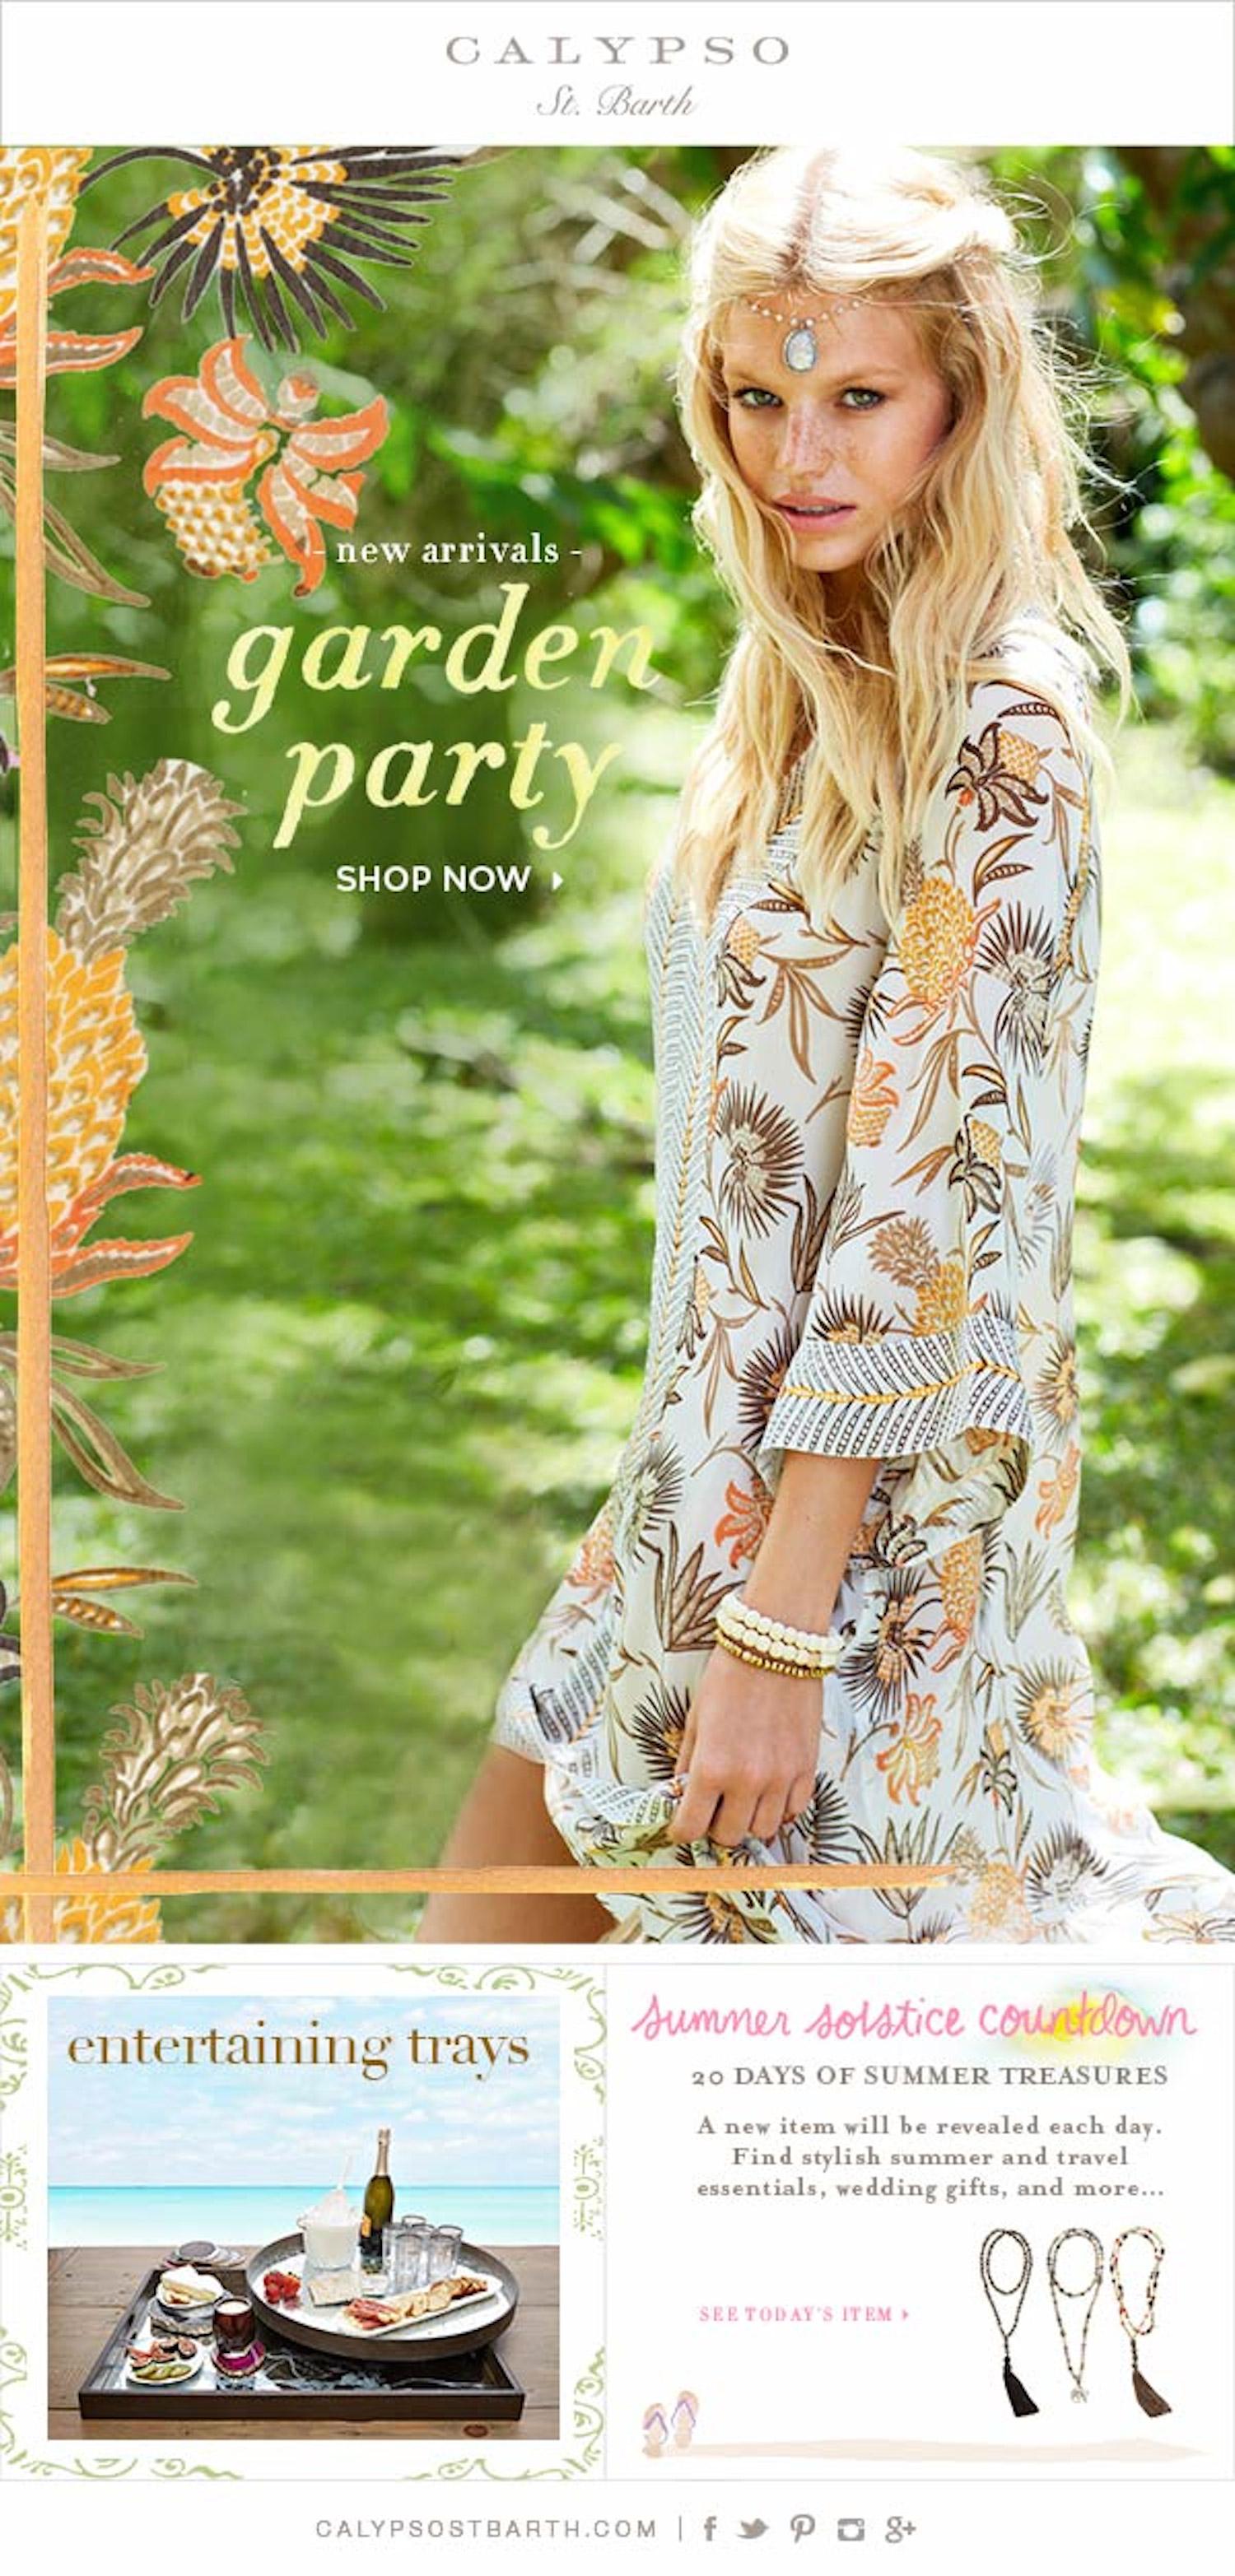 garden party calypso st barth in barbados with nadine leopold and matt jones